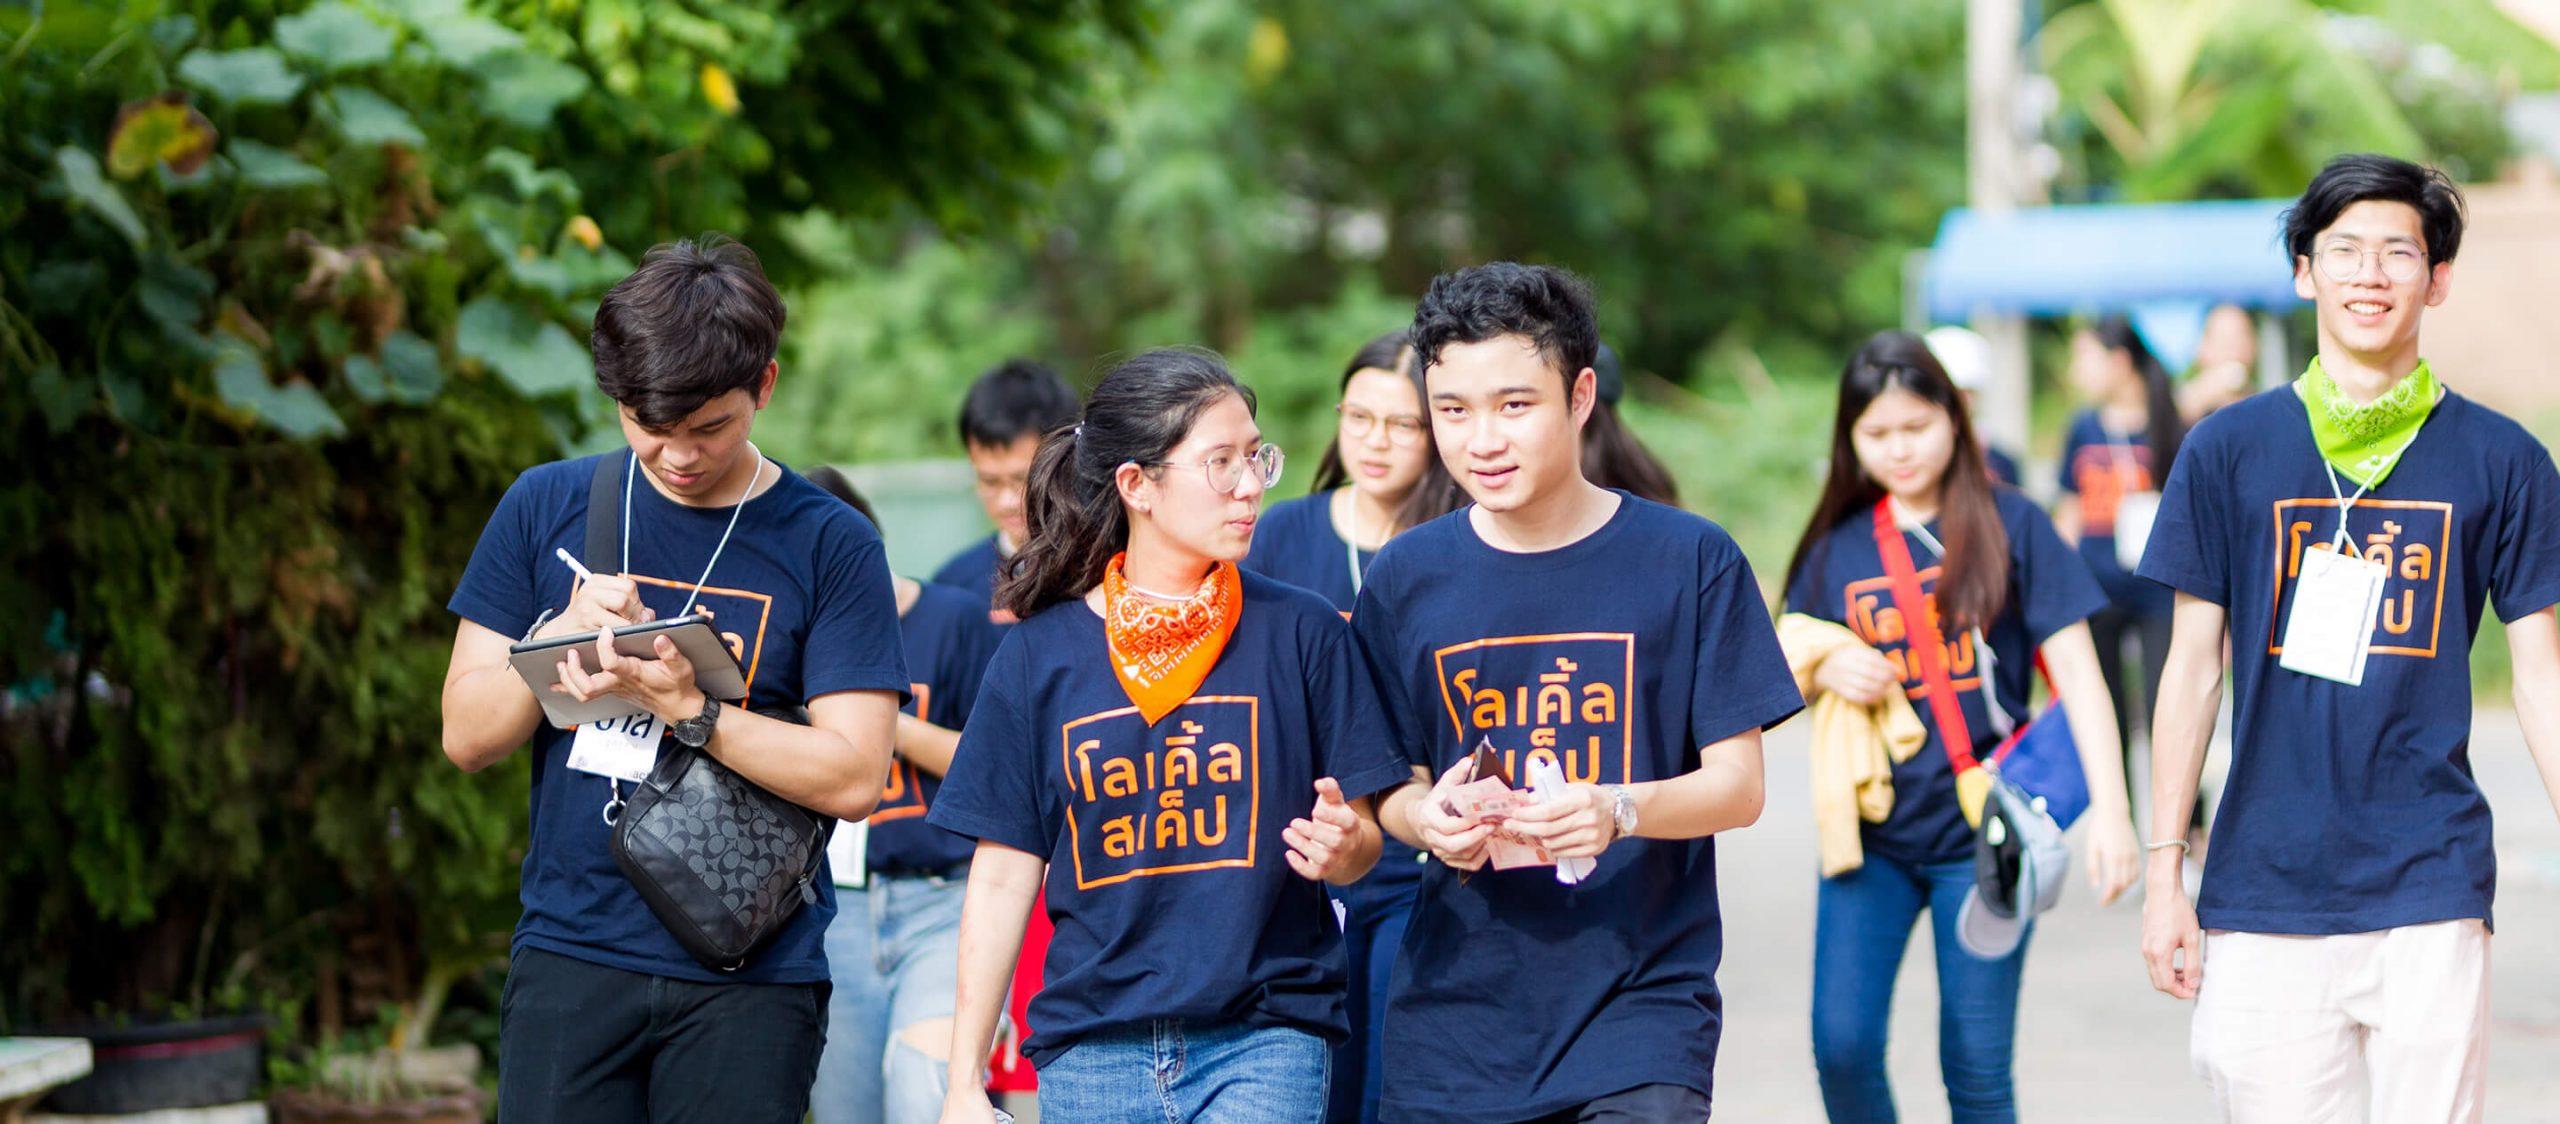 Tact บริษัทที่ตั้งใจทำให้โลกดีขึ้นและพัฒนาวัยรุ่นผ่านการเป็นที่ปรึกษาเพื่อสังคม